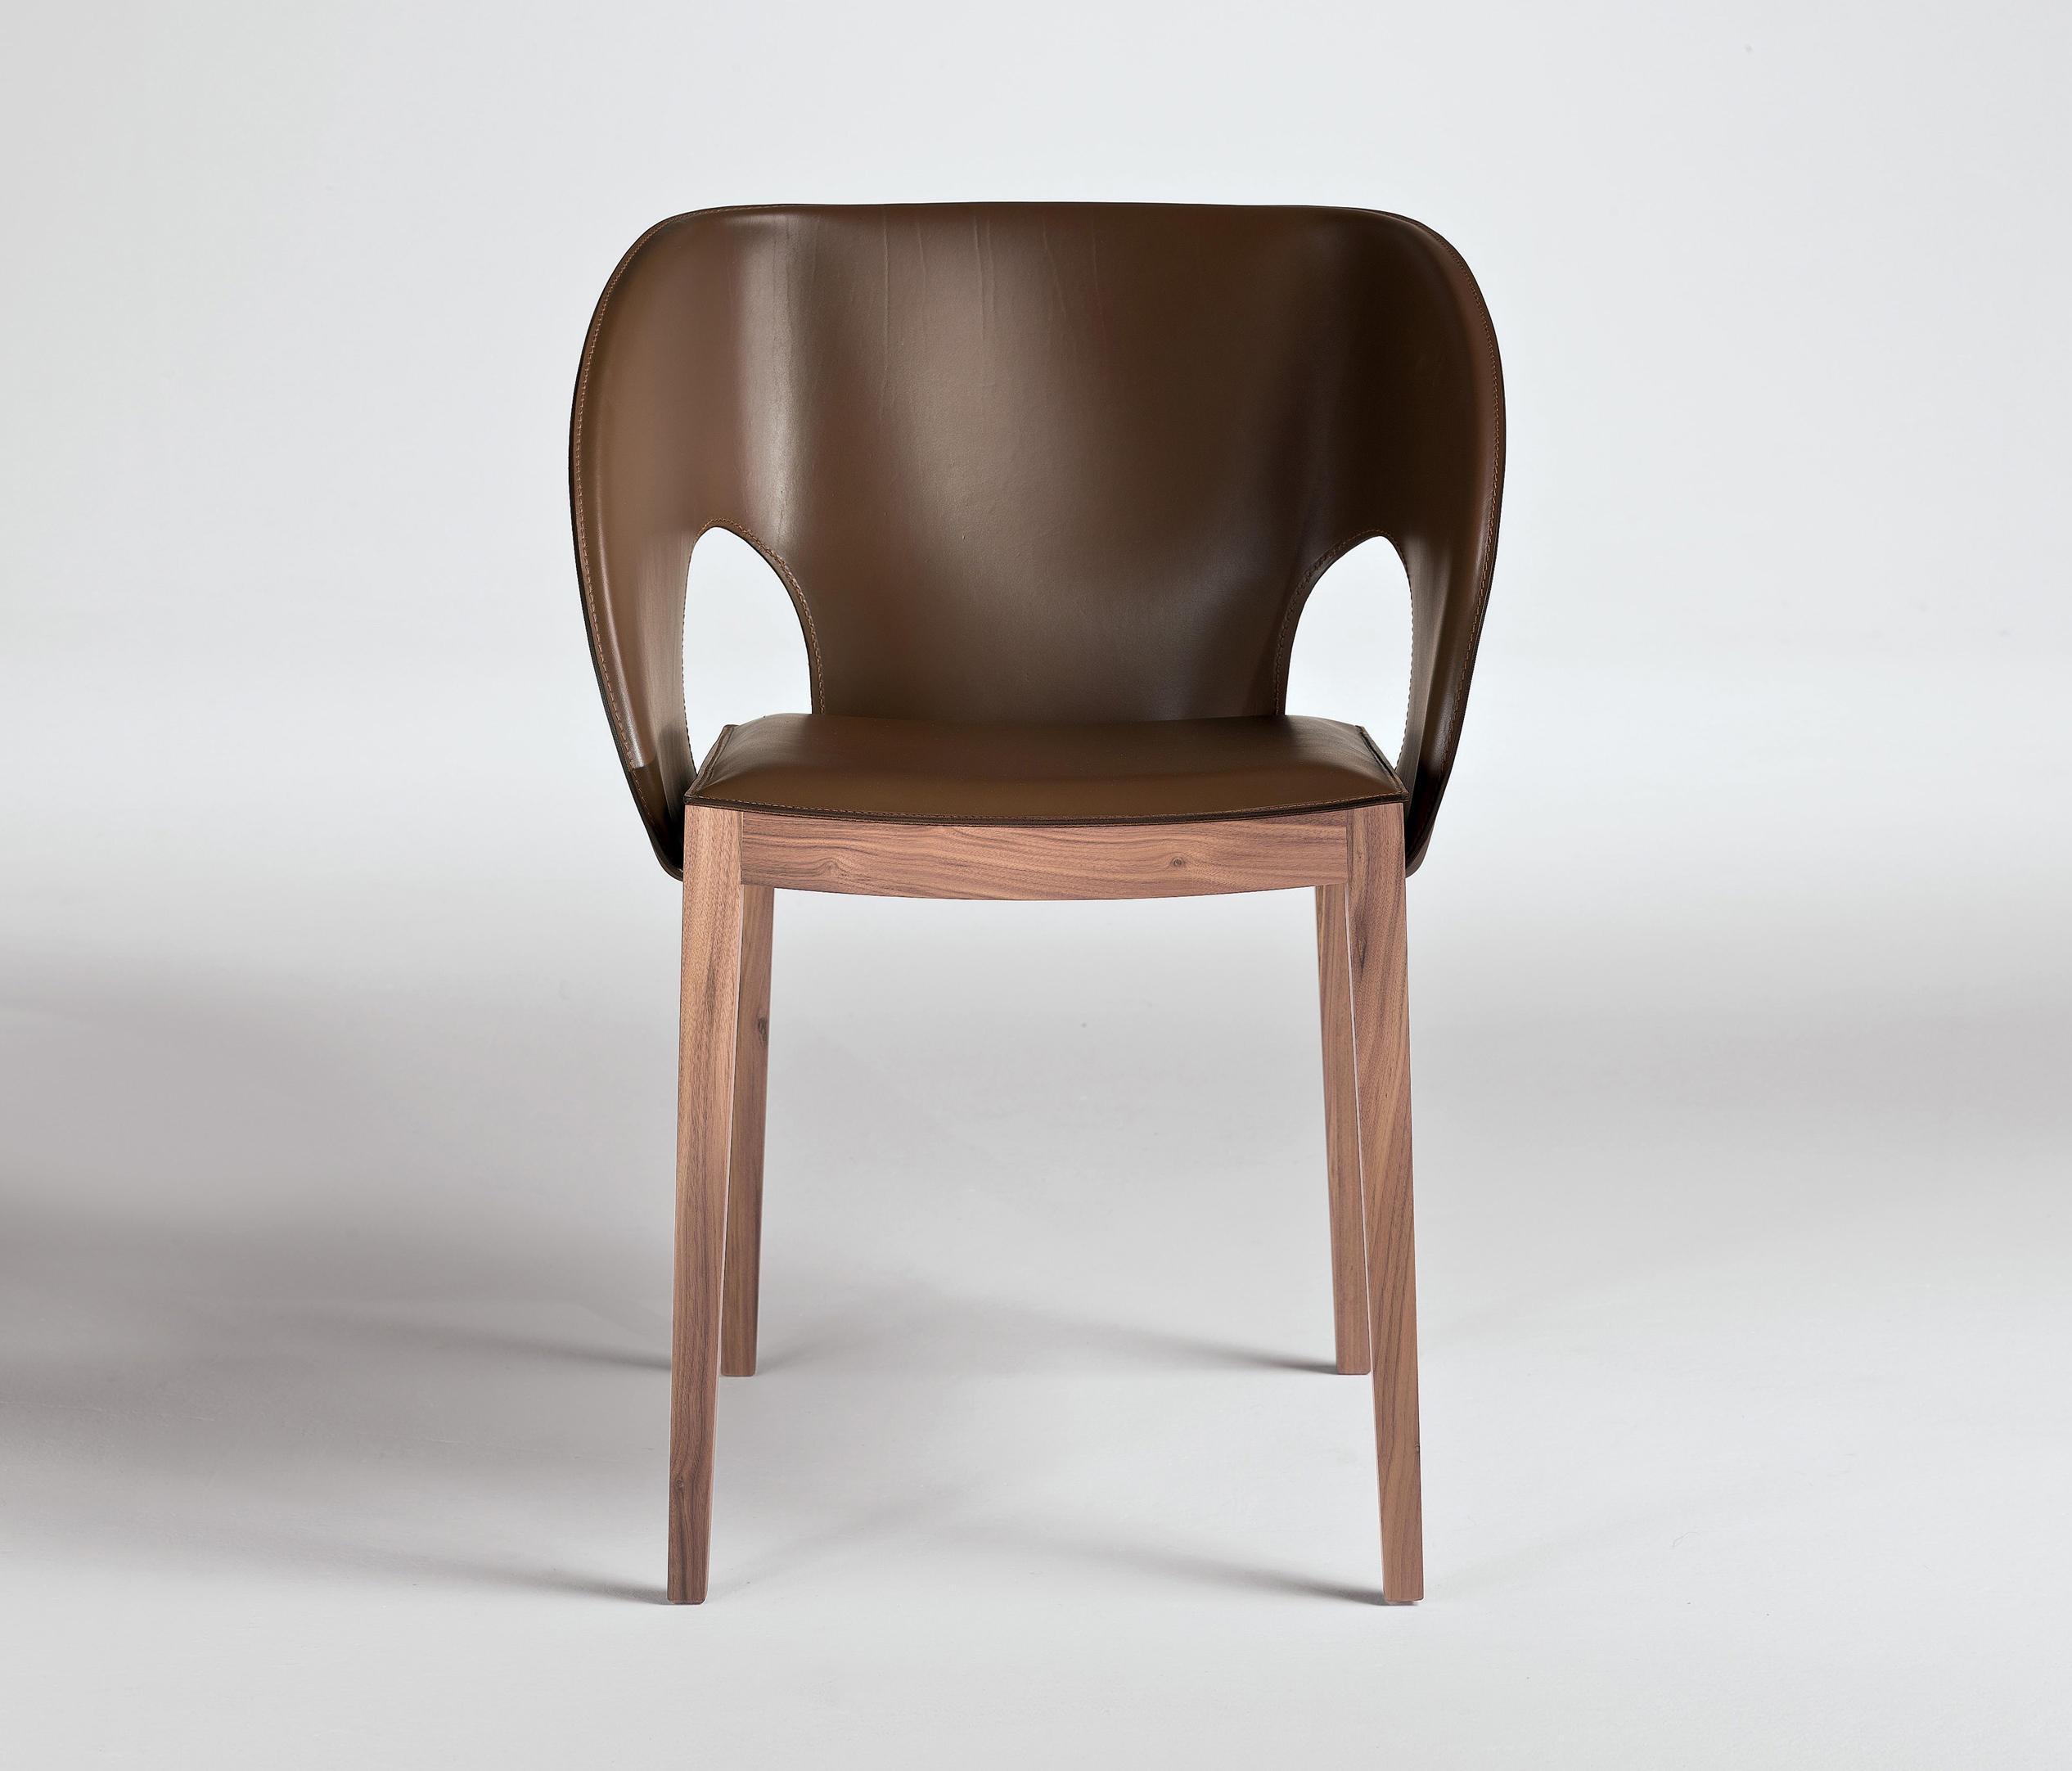 Voile sedie i 4 mariani architonic for I 4 mariani